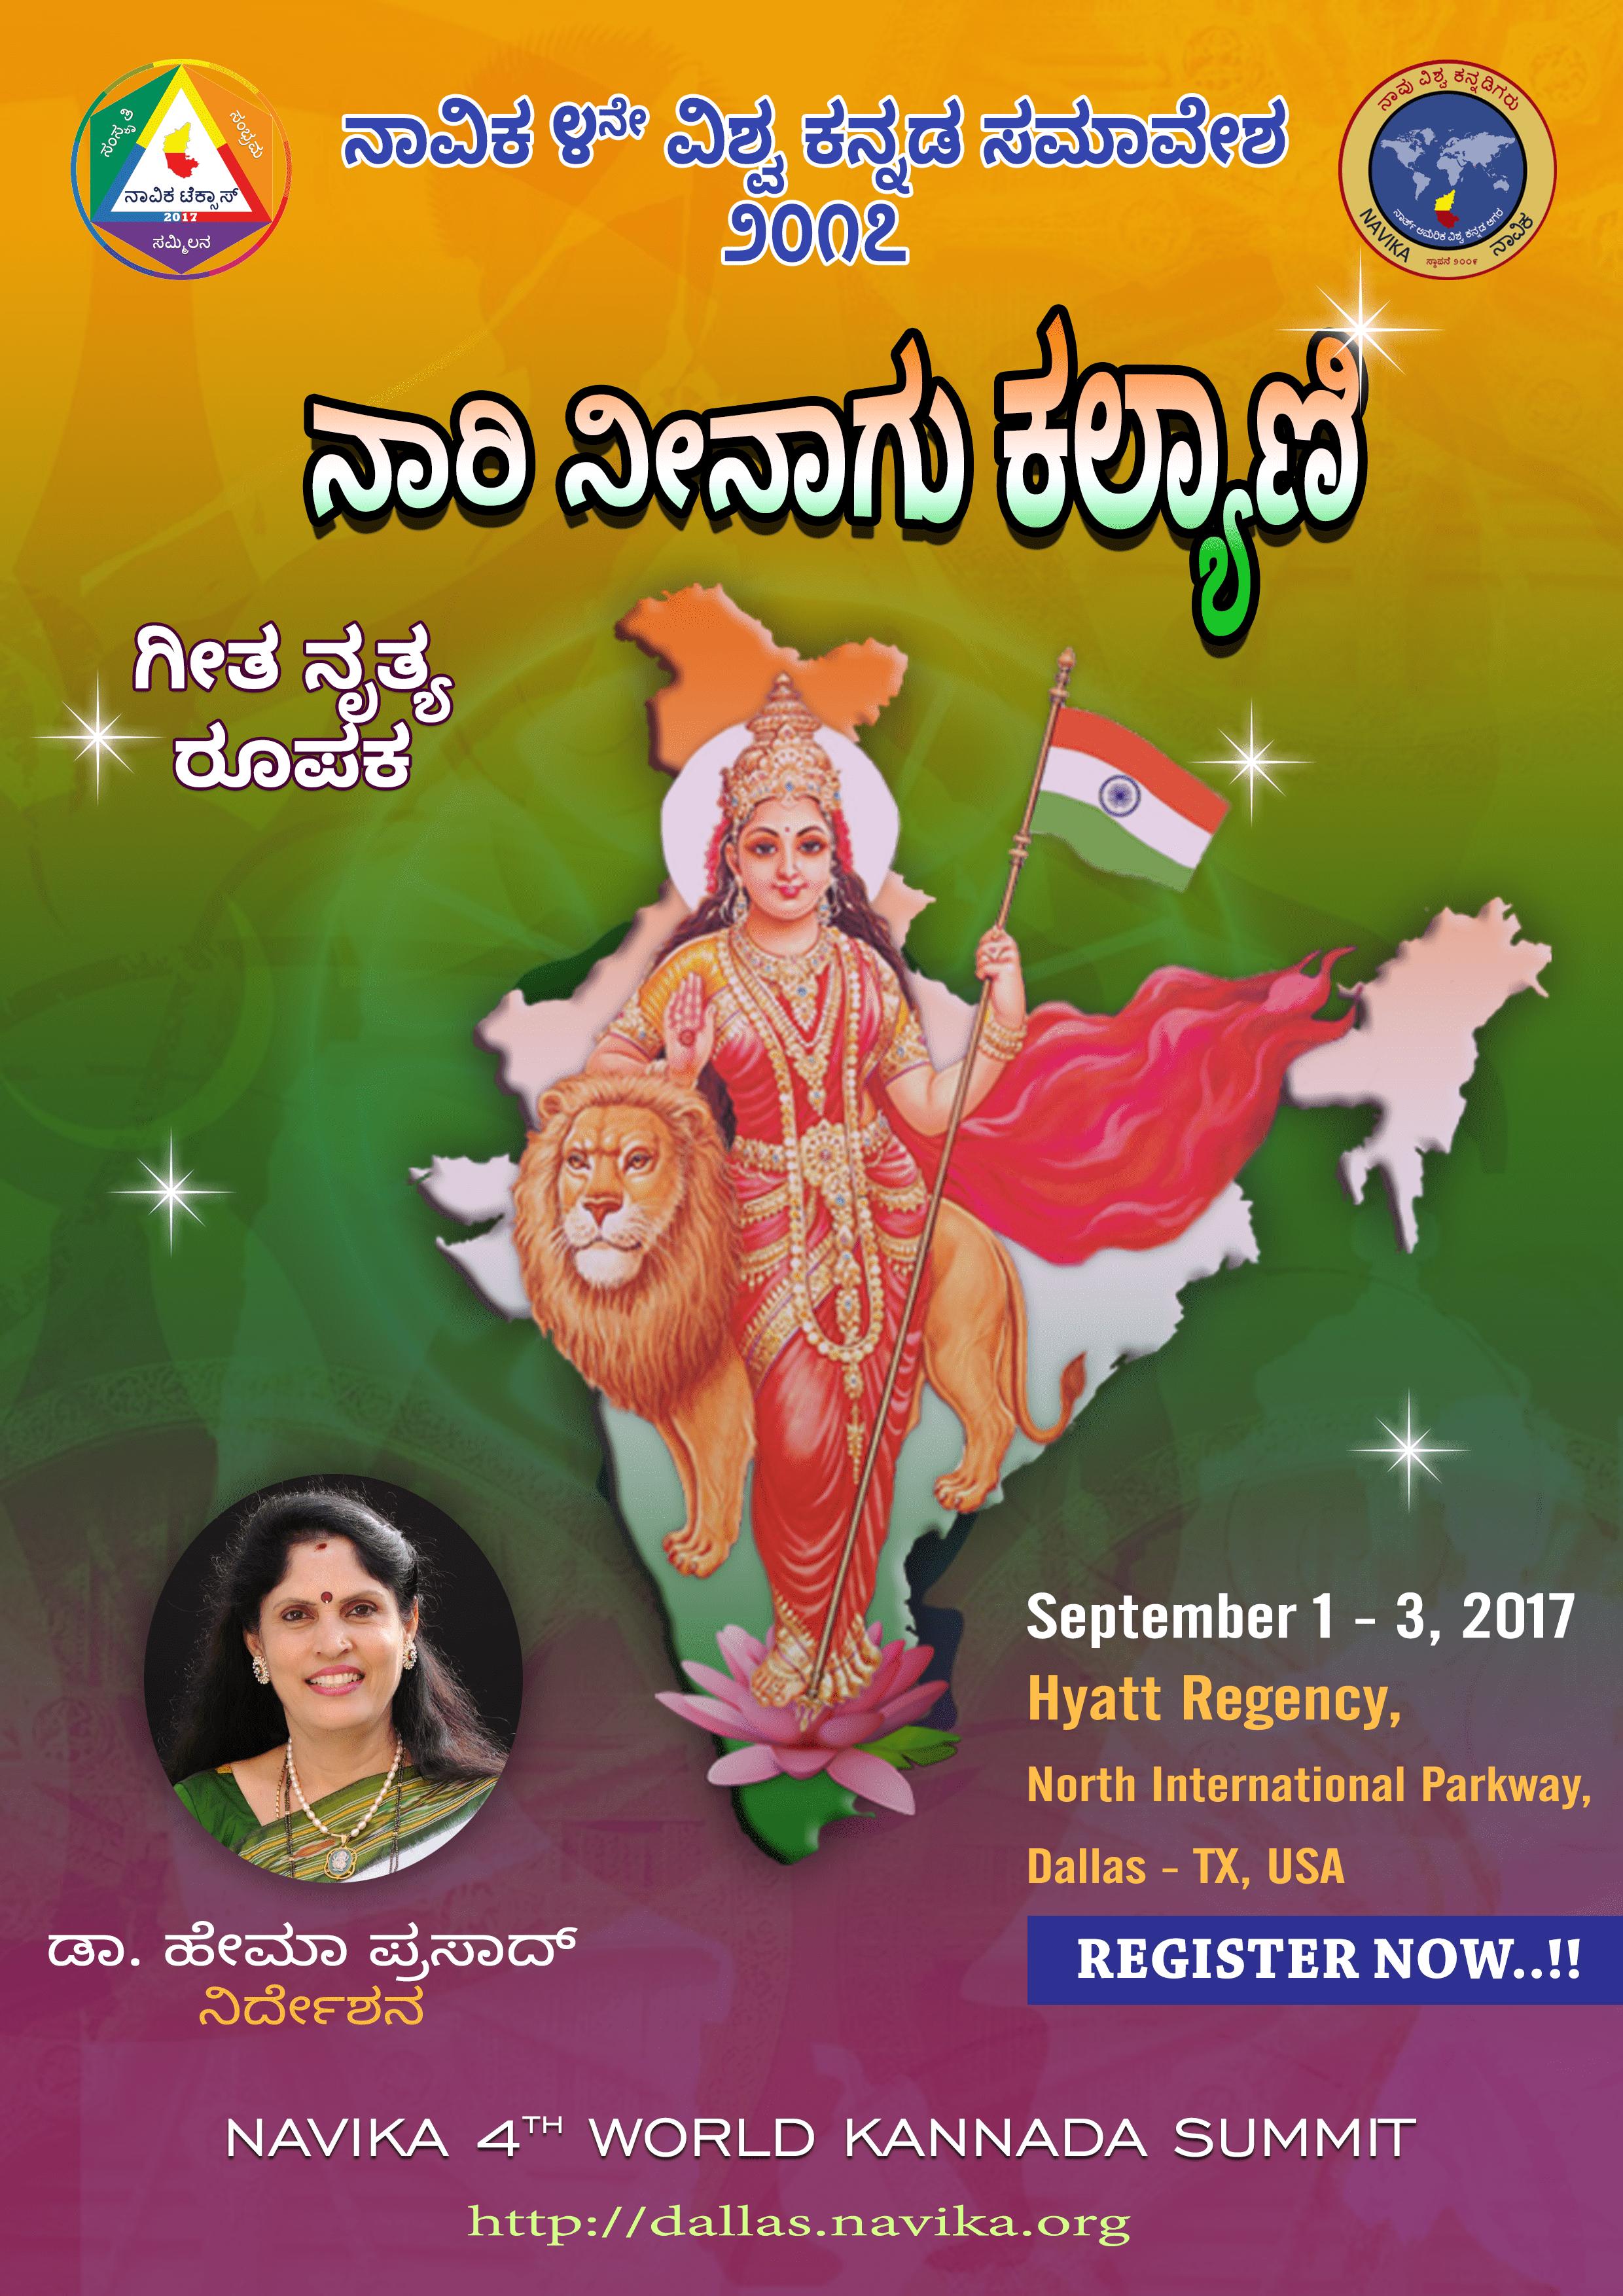 Nari Ninagu Kalyani - Geetha Nruthya Rupaka @ Navika 2017